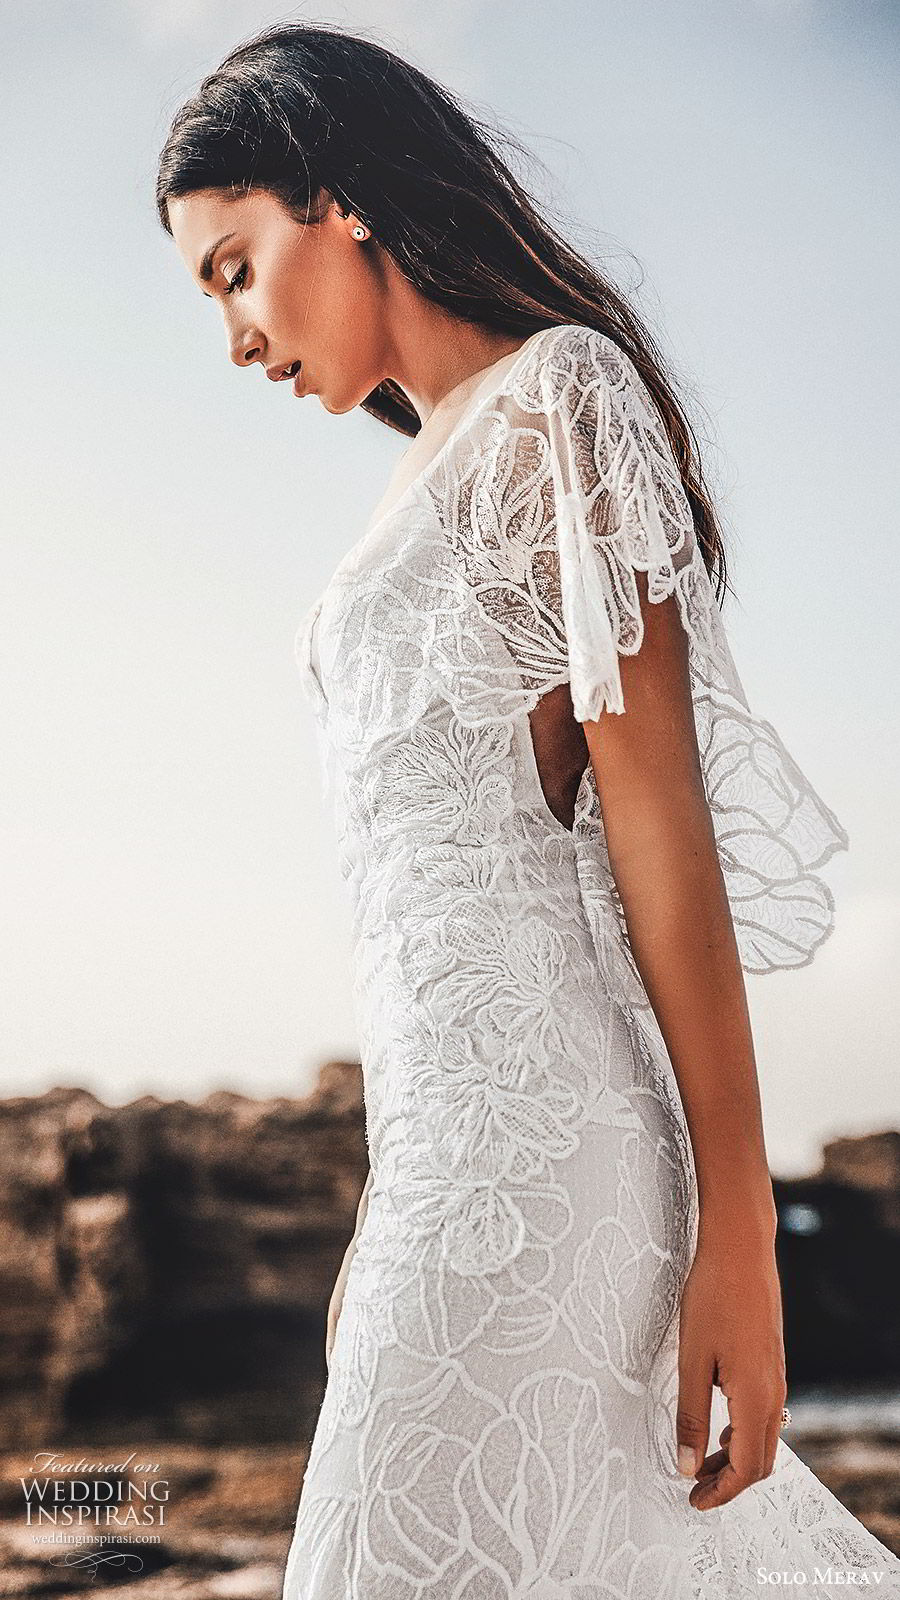 solo merav 2019 bridal flutter sleeves plunging v neckline sheath embellished lace wedding dress (2) zsv sweep train bohemian romantic